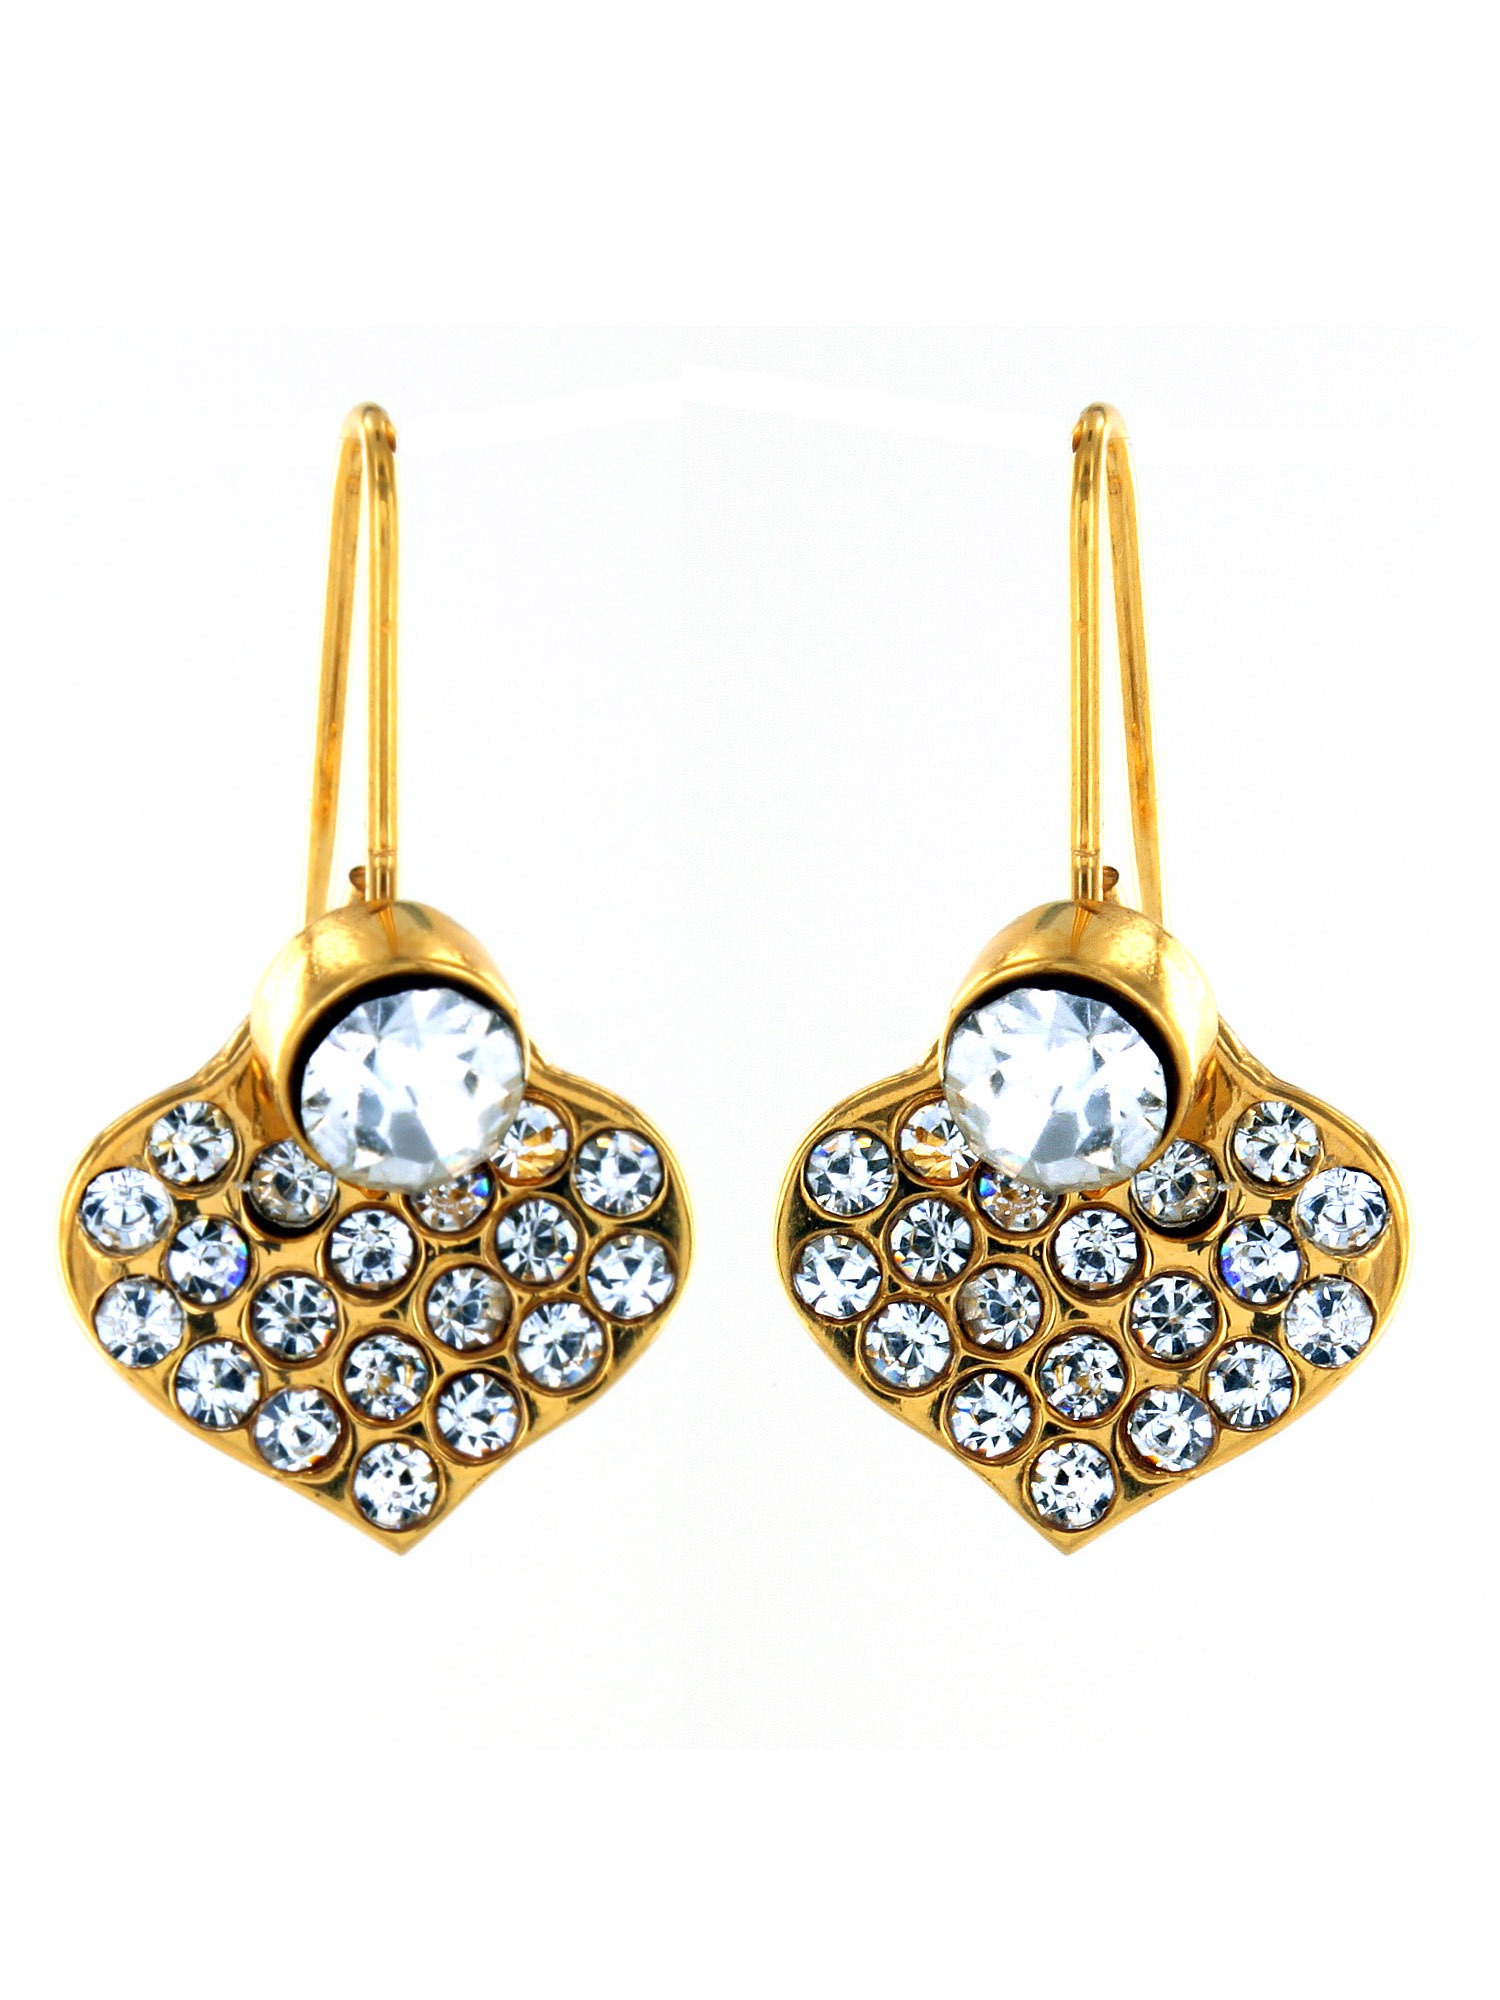 Crystal Heart Dangling Gold IP Stainless Steel Earrings